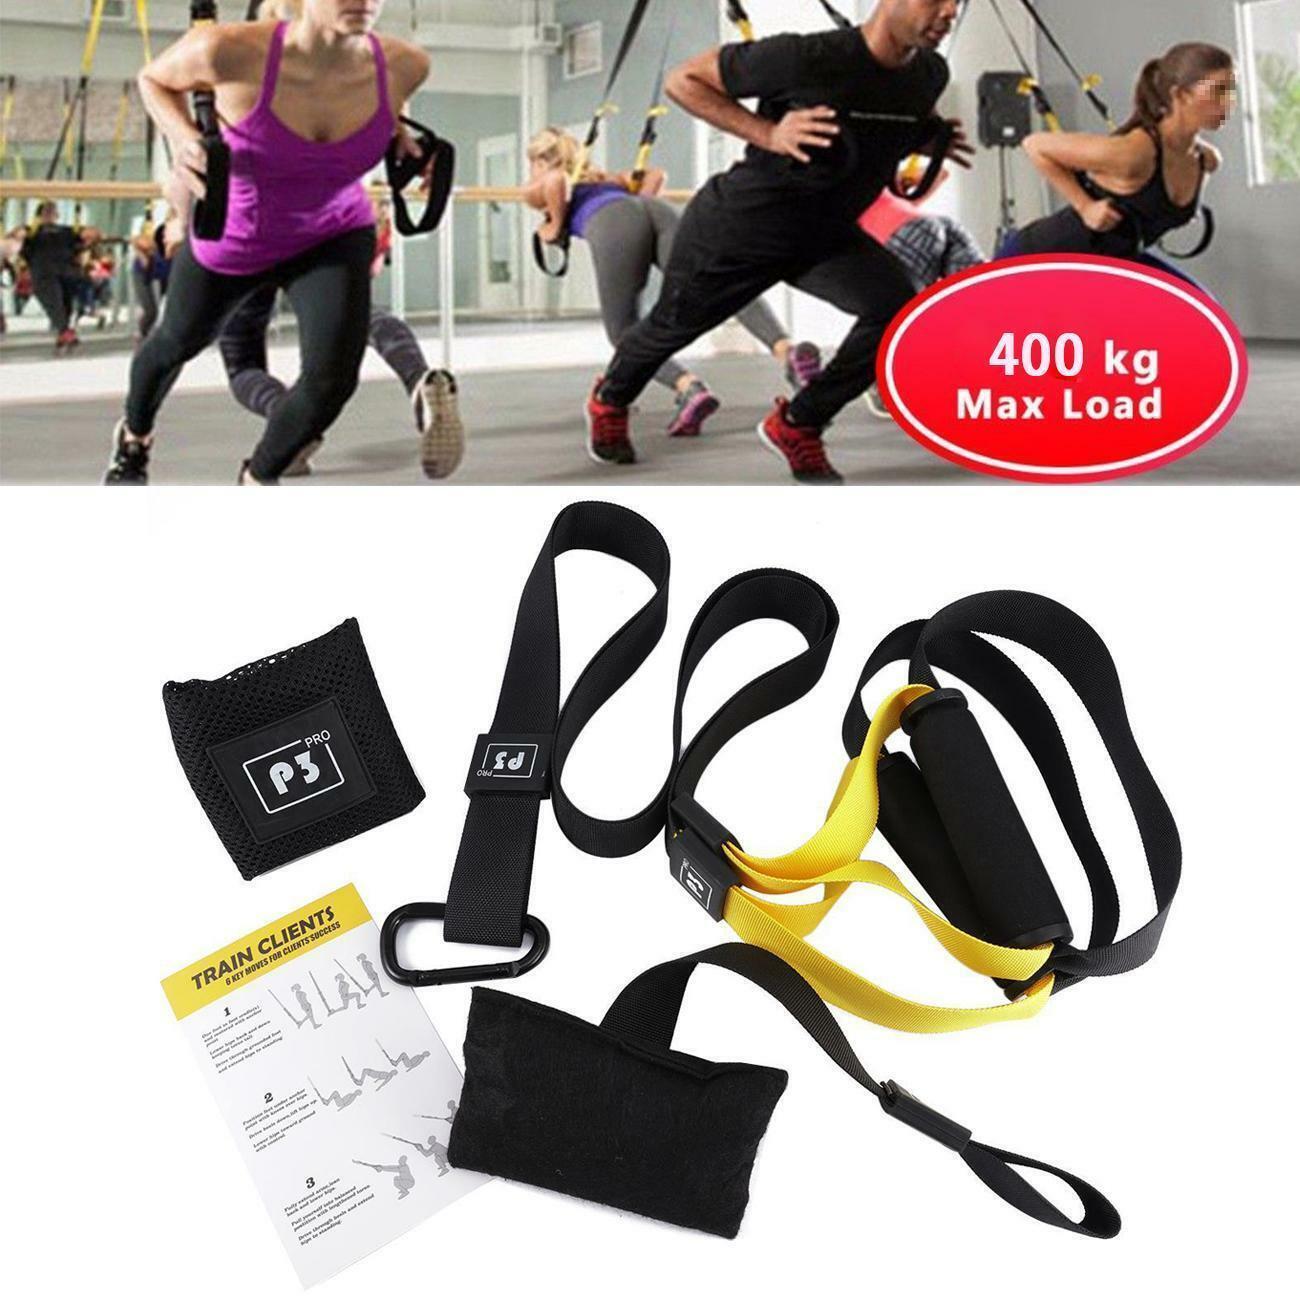 Resistance Training Straps Crossfit Workout Sport Home Fitness PRO 1 2 3 TRE